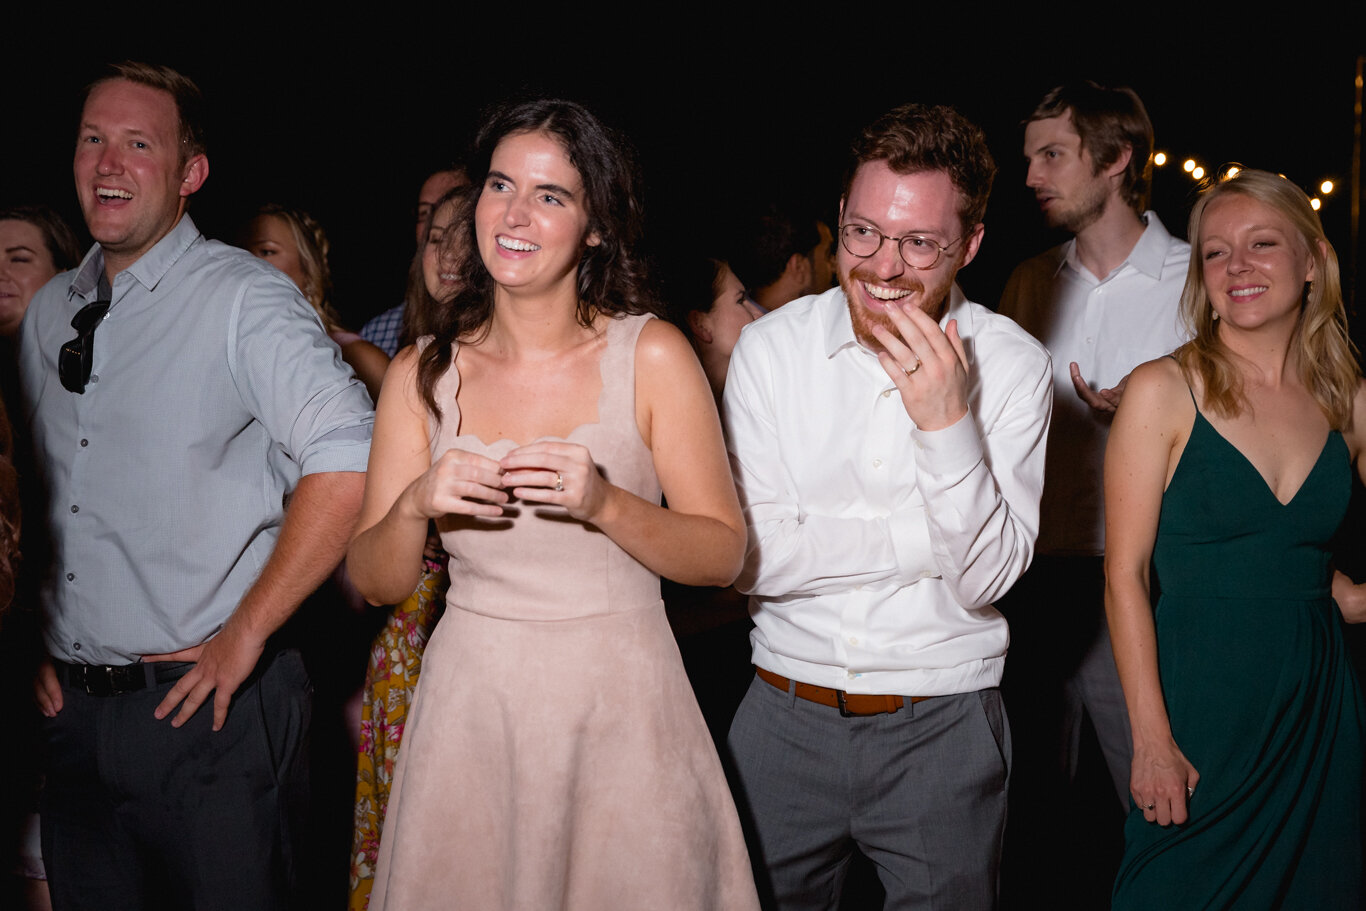 2019.08.24_Emily-Ashir-Wedding-at-the-Maples-6430.jpg